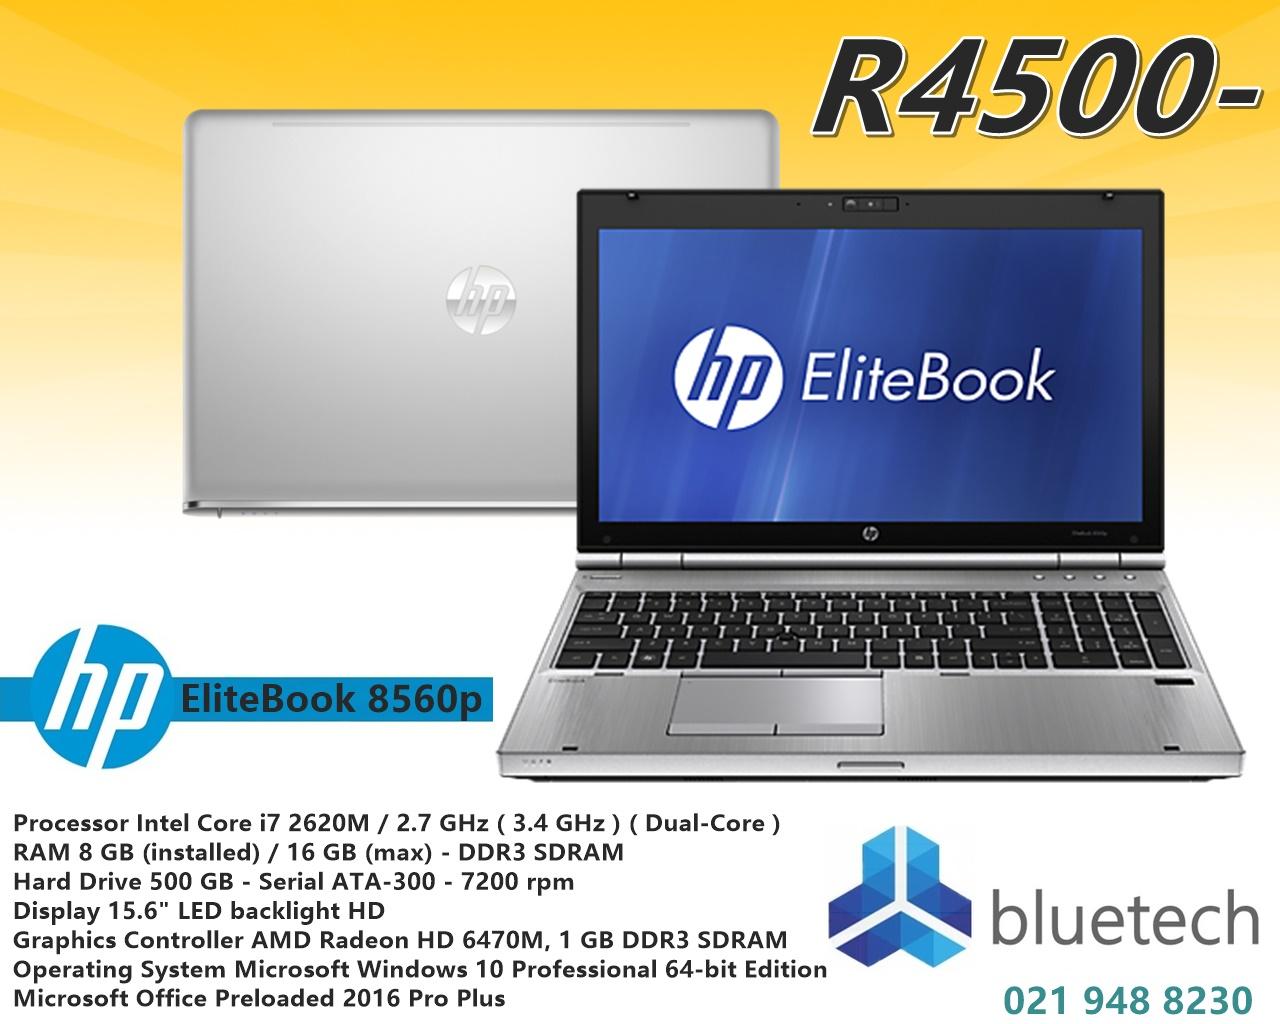 "Demo HP EliteBook 8560p - 15.6"" - Core i7 - Windows 10 Pro 64-bit - 8 GB RAM - 500 GB HDD"